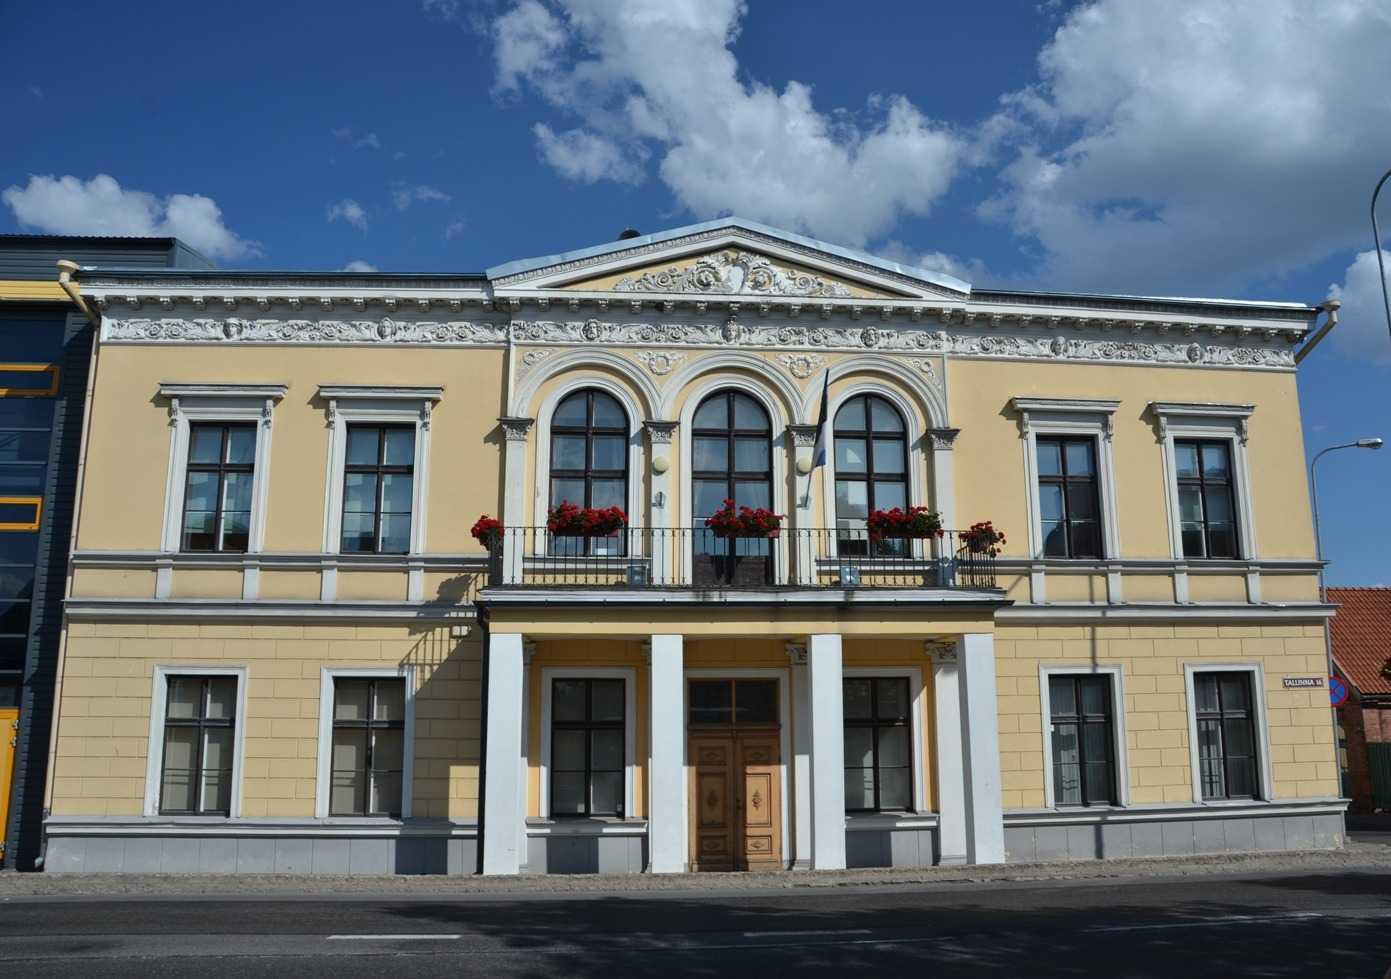 Tallinna Caddesi 6 numaradaki ev…